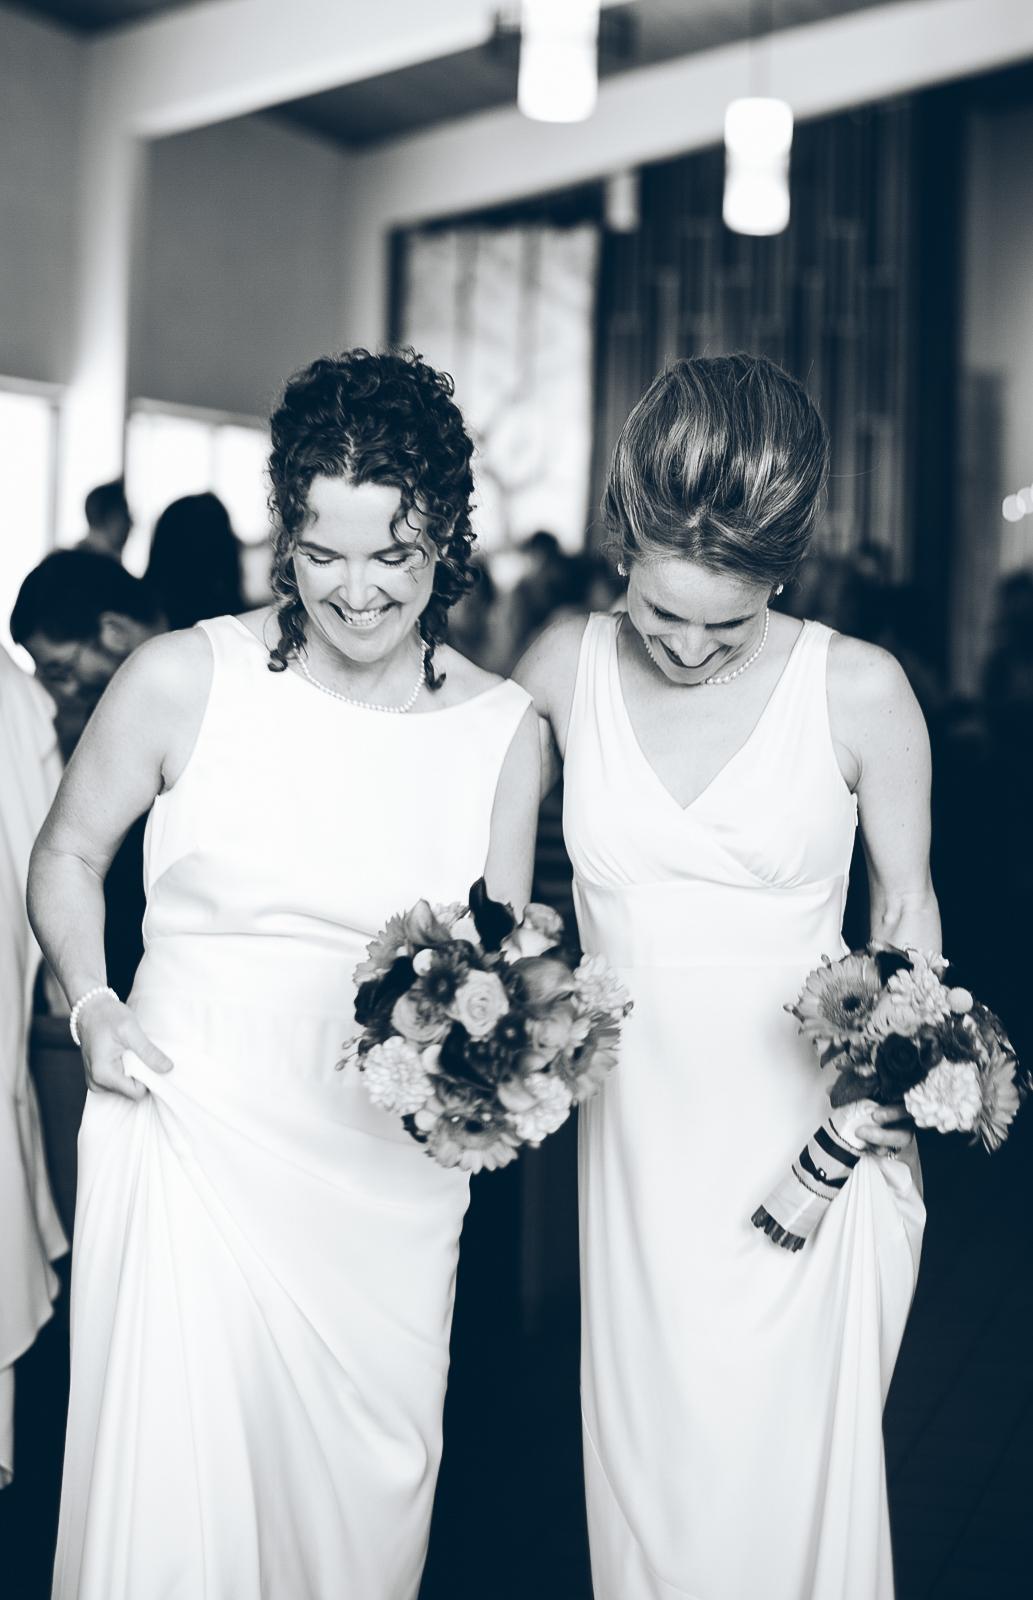 Riverside_ca_wedding_photography_marguerite_carolyn_ebony_siovhan_bokeh_photography_38.jpg